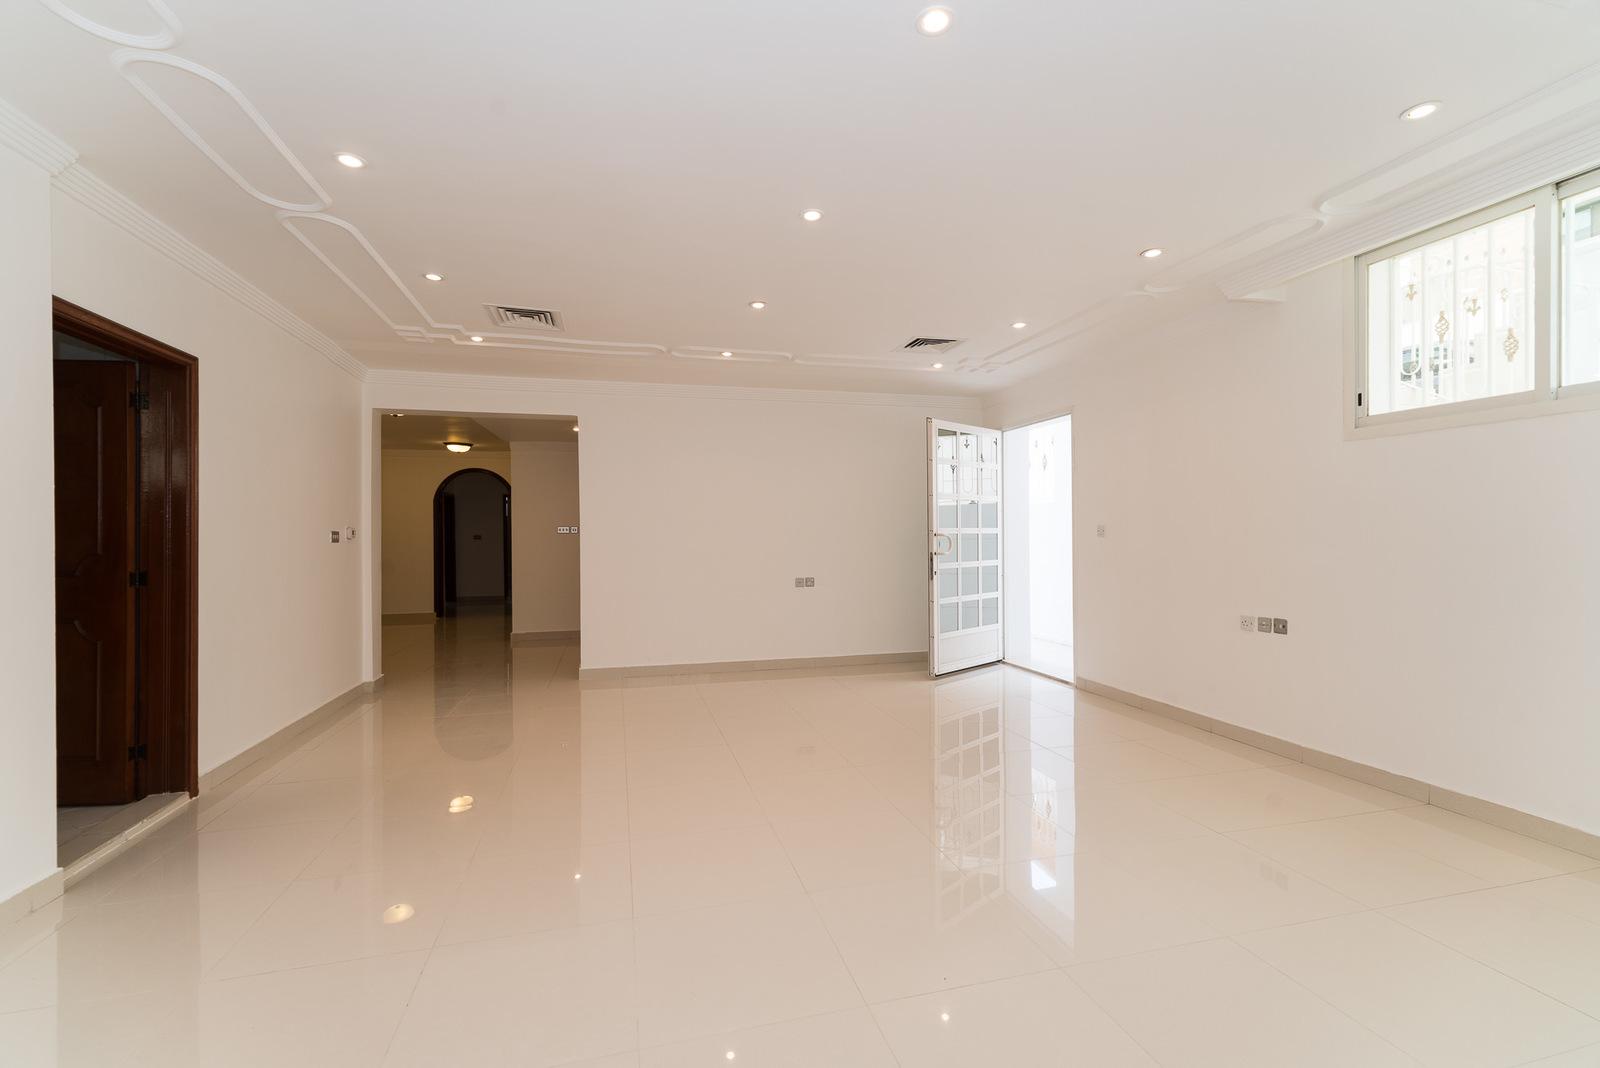 Salwa – spacious, light, unfurnished, basement apartment